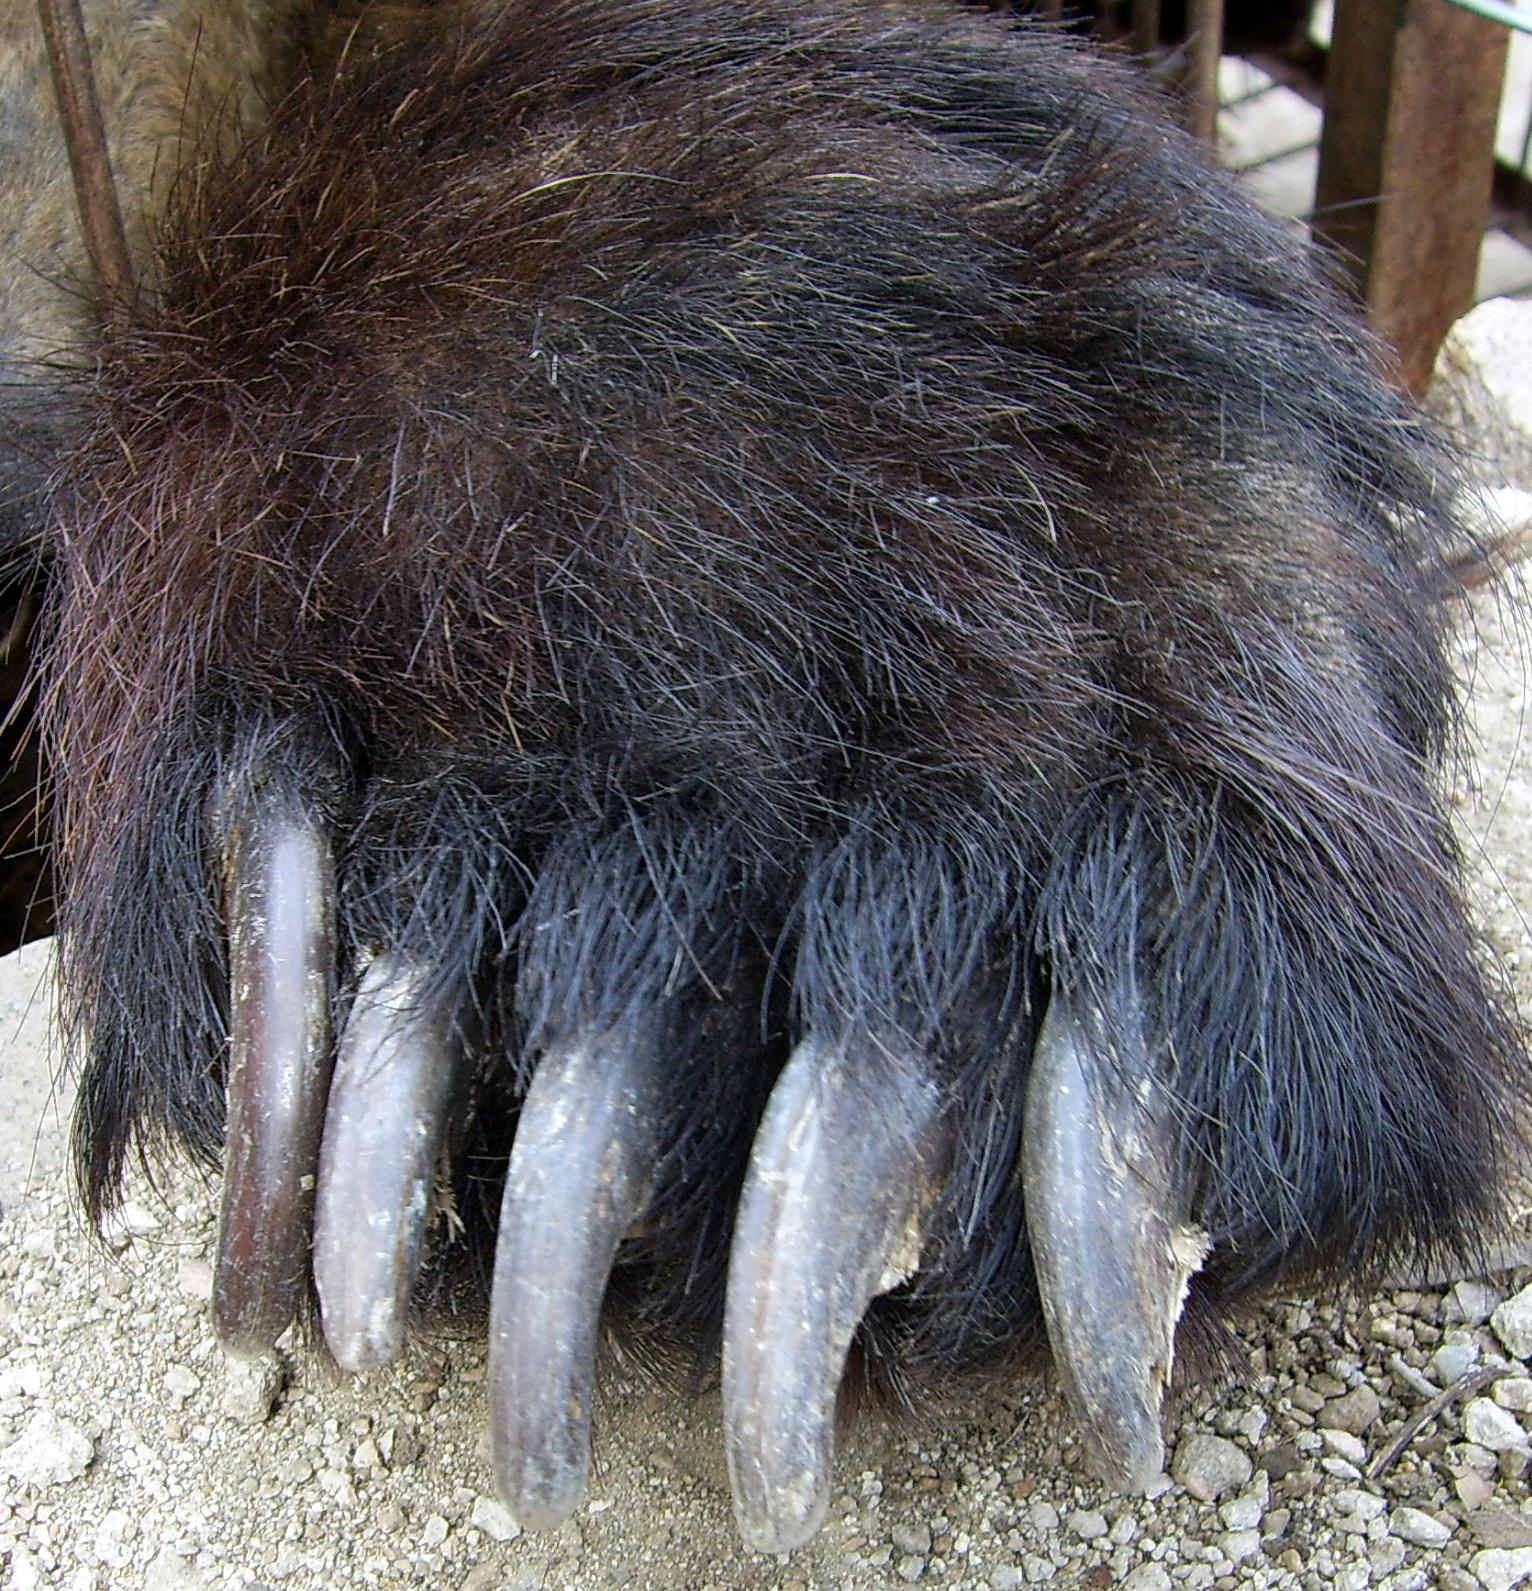 File:Bear paw.jpg - Wikimedia Commons